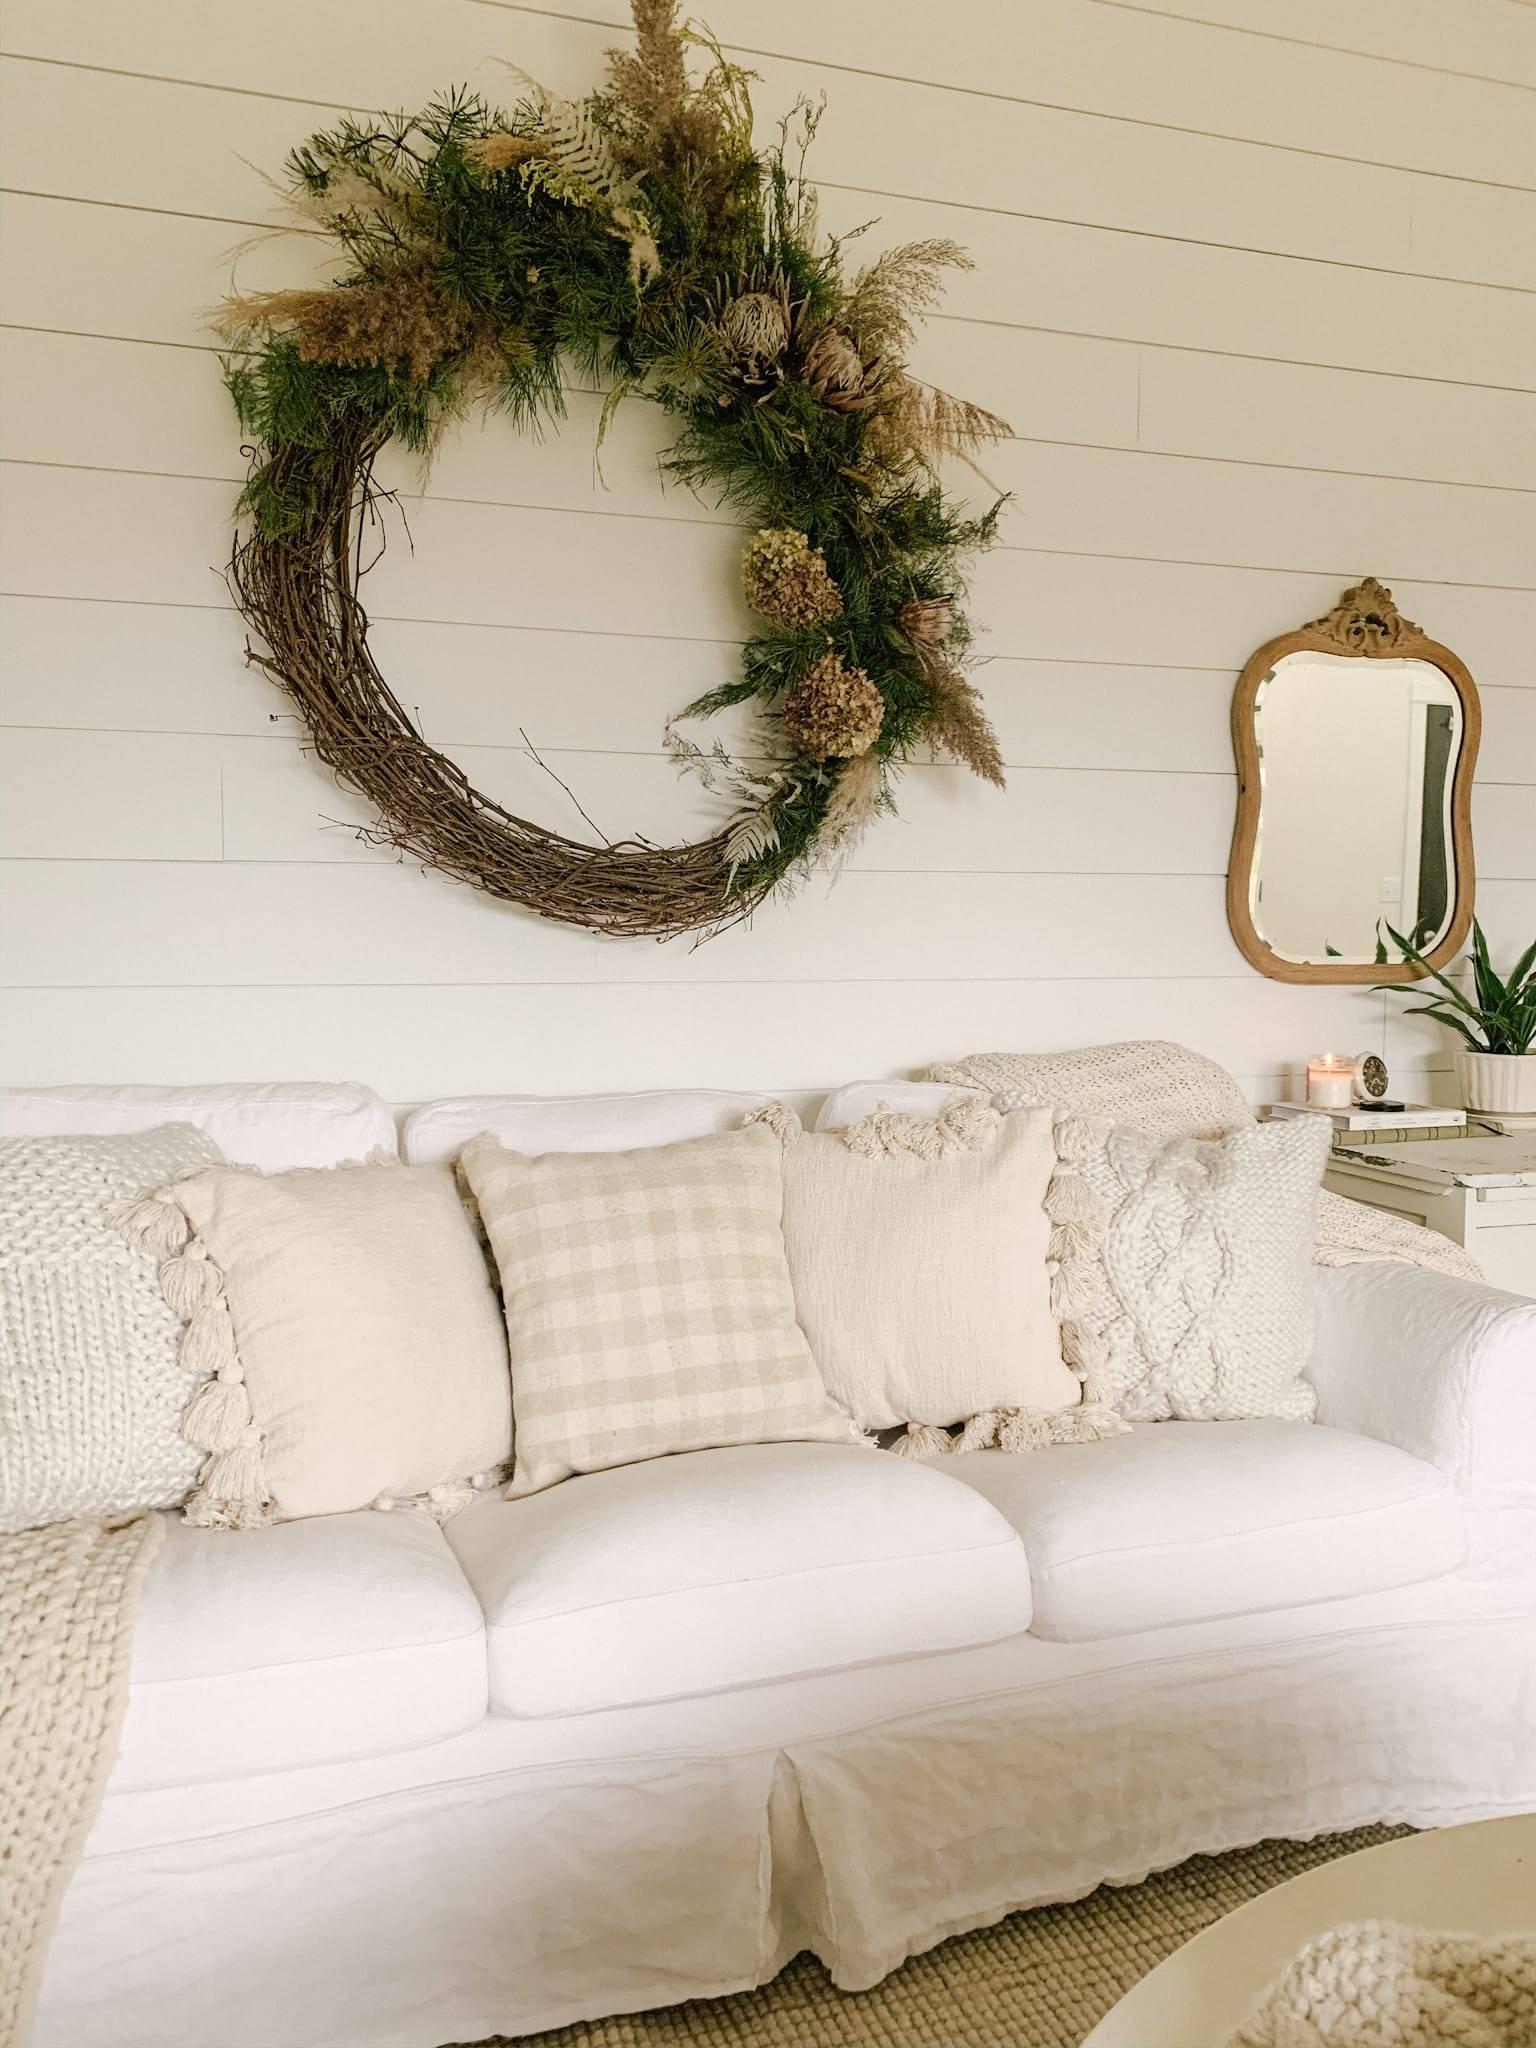 Shiplap Wall with Flower Wreath